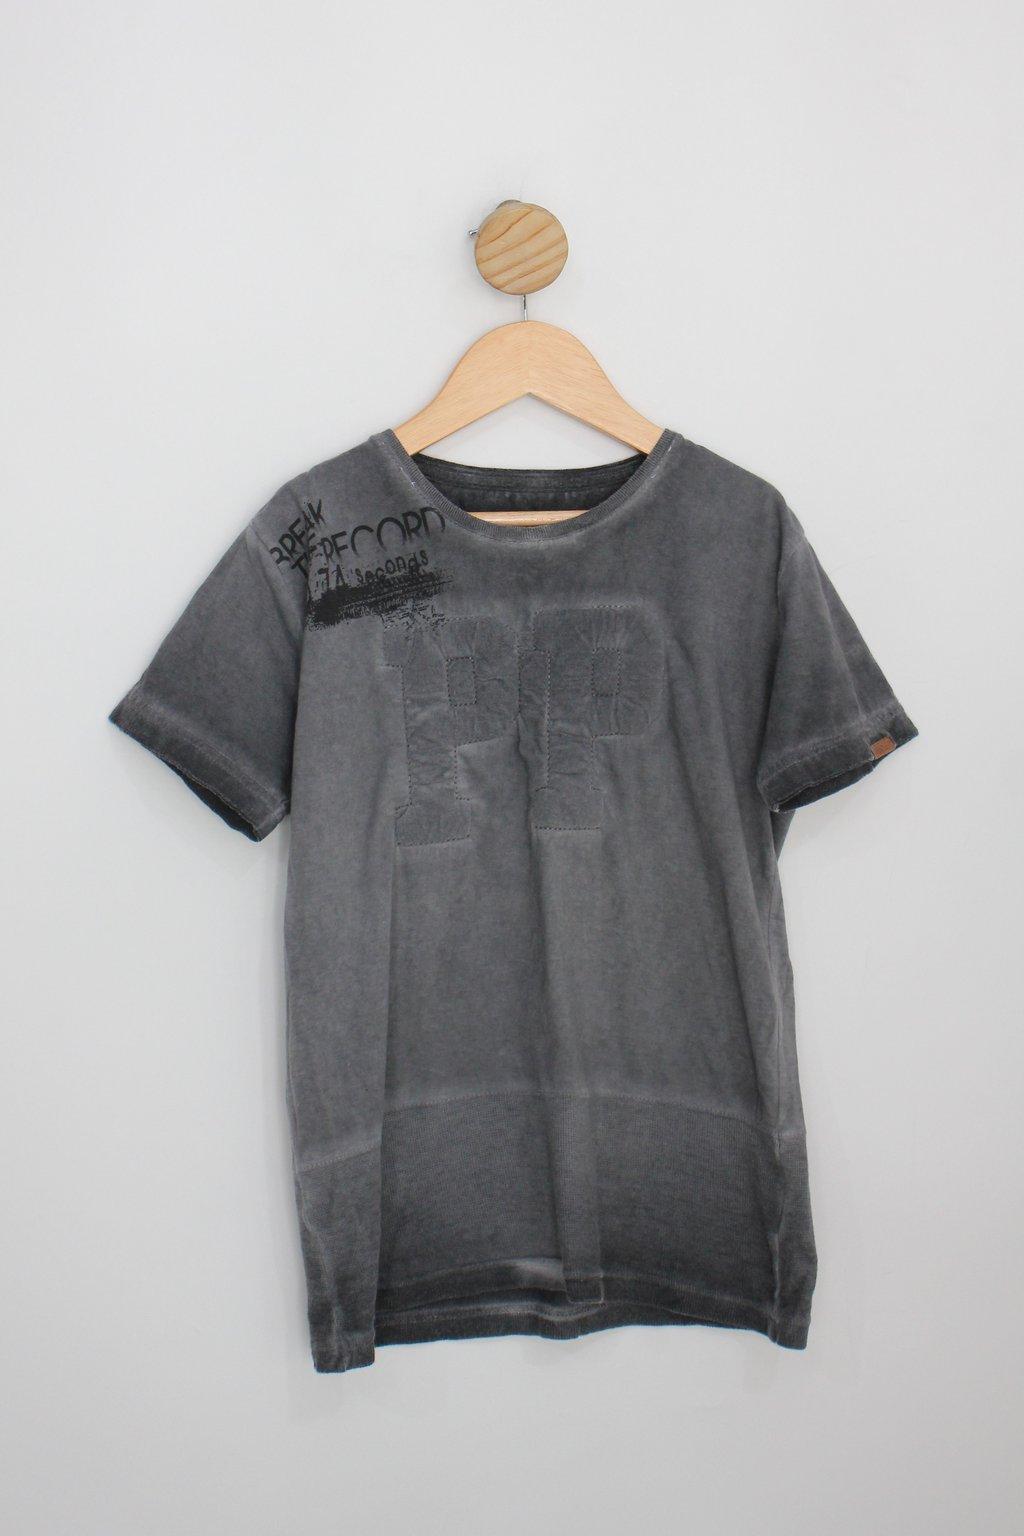 Camiseta Infantil Planeta Pano Cinza